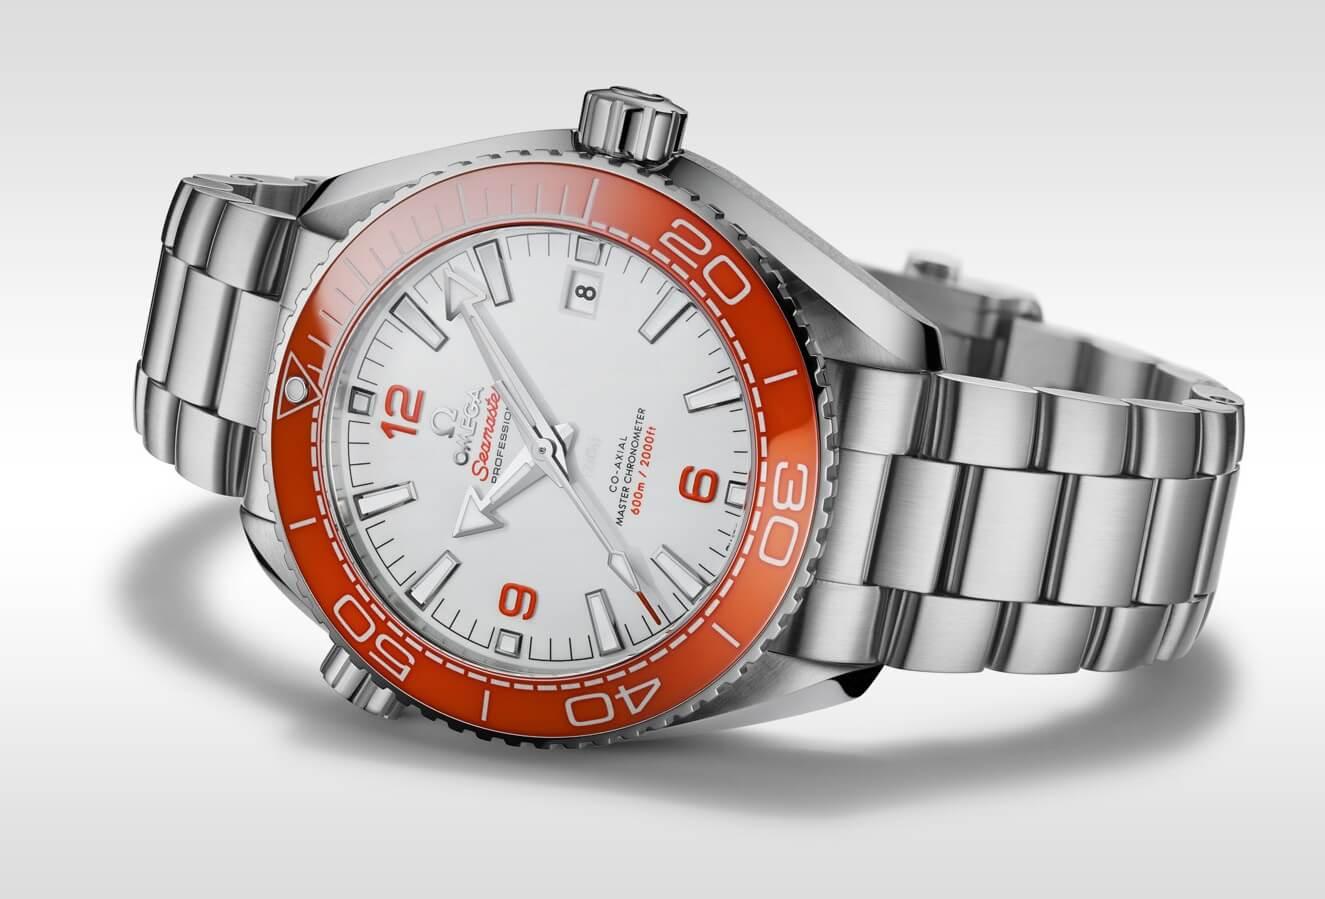 Fake Omega Seamaster Planet Ocean Watch With Orange Bezel